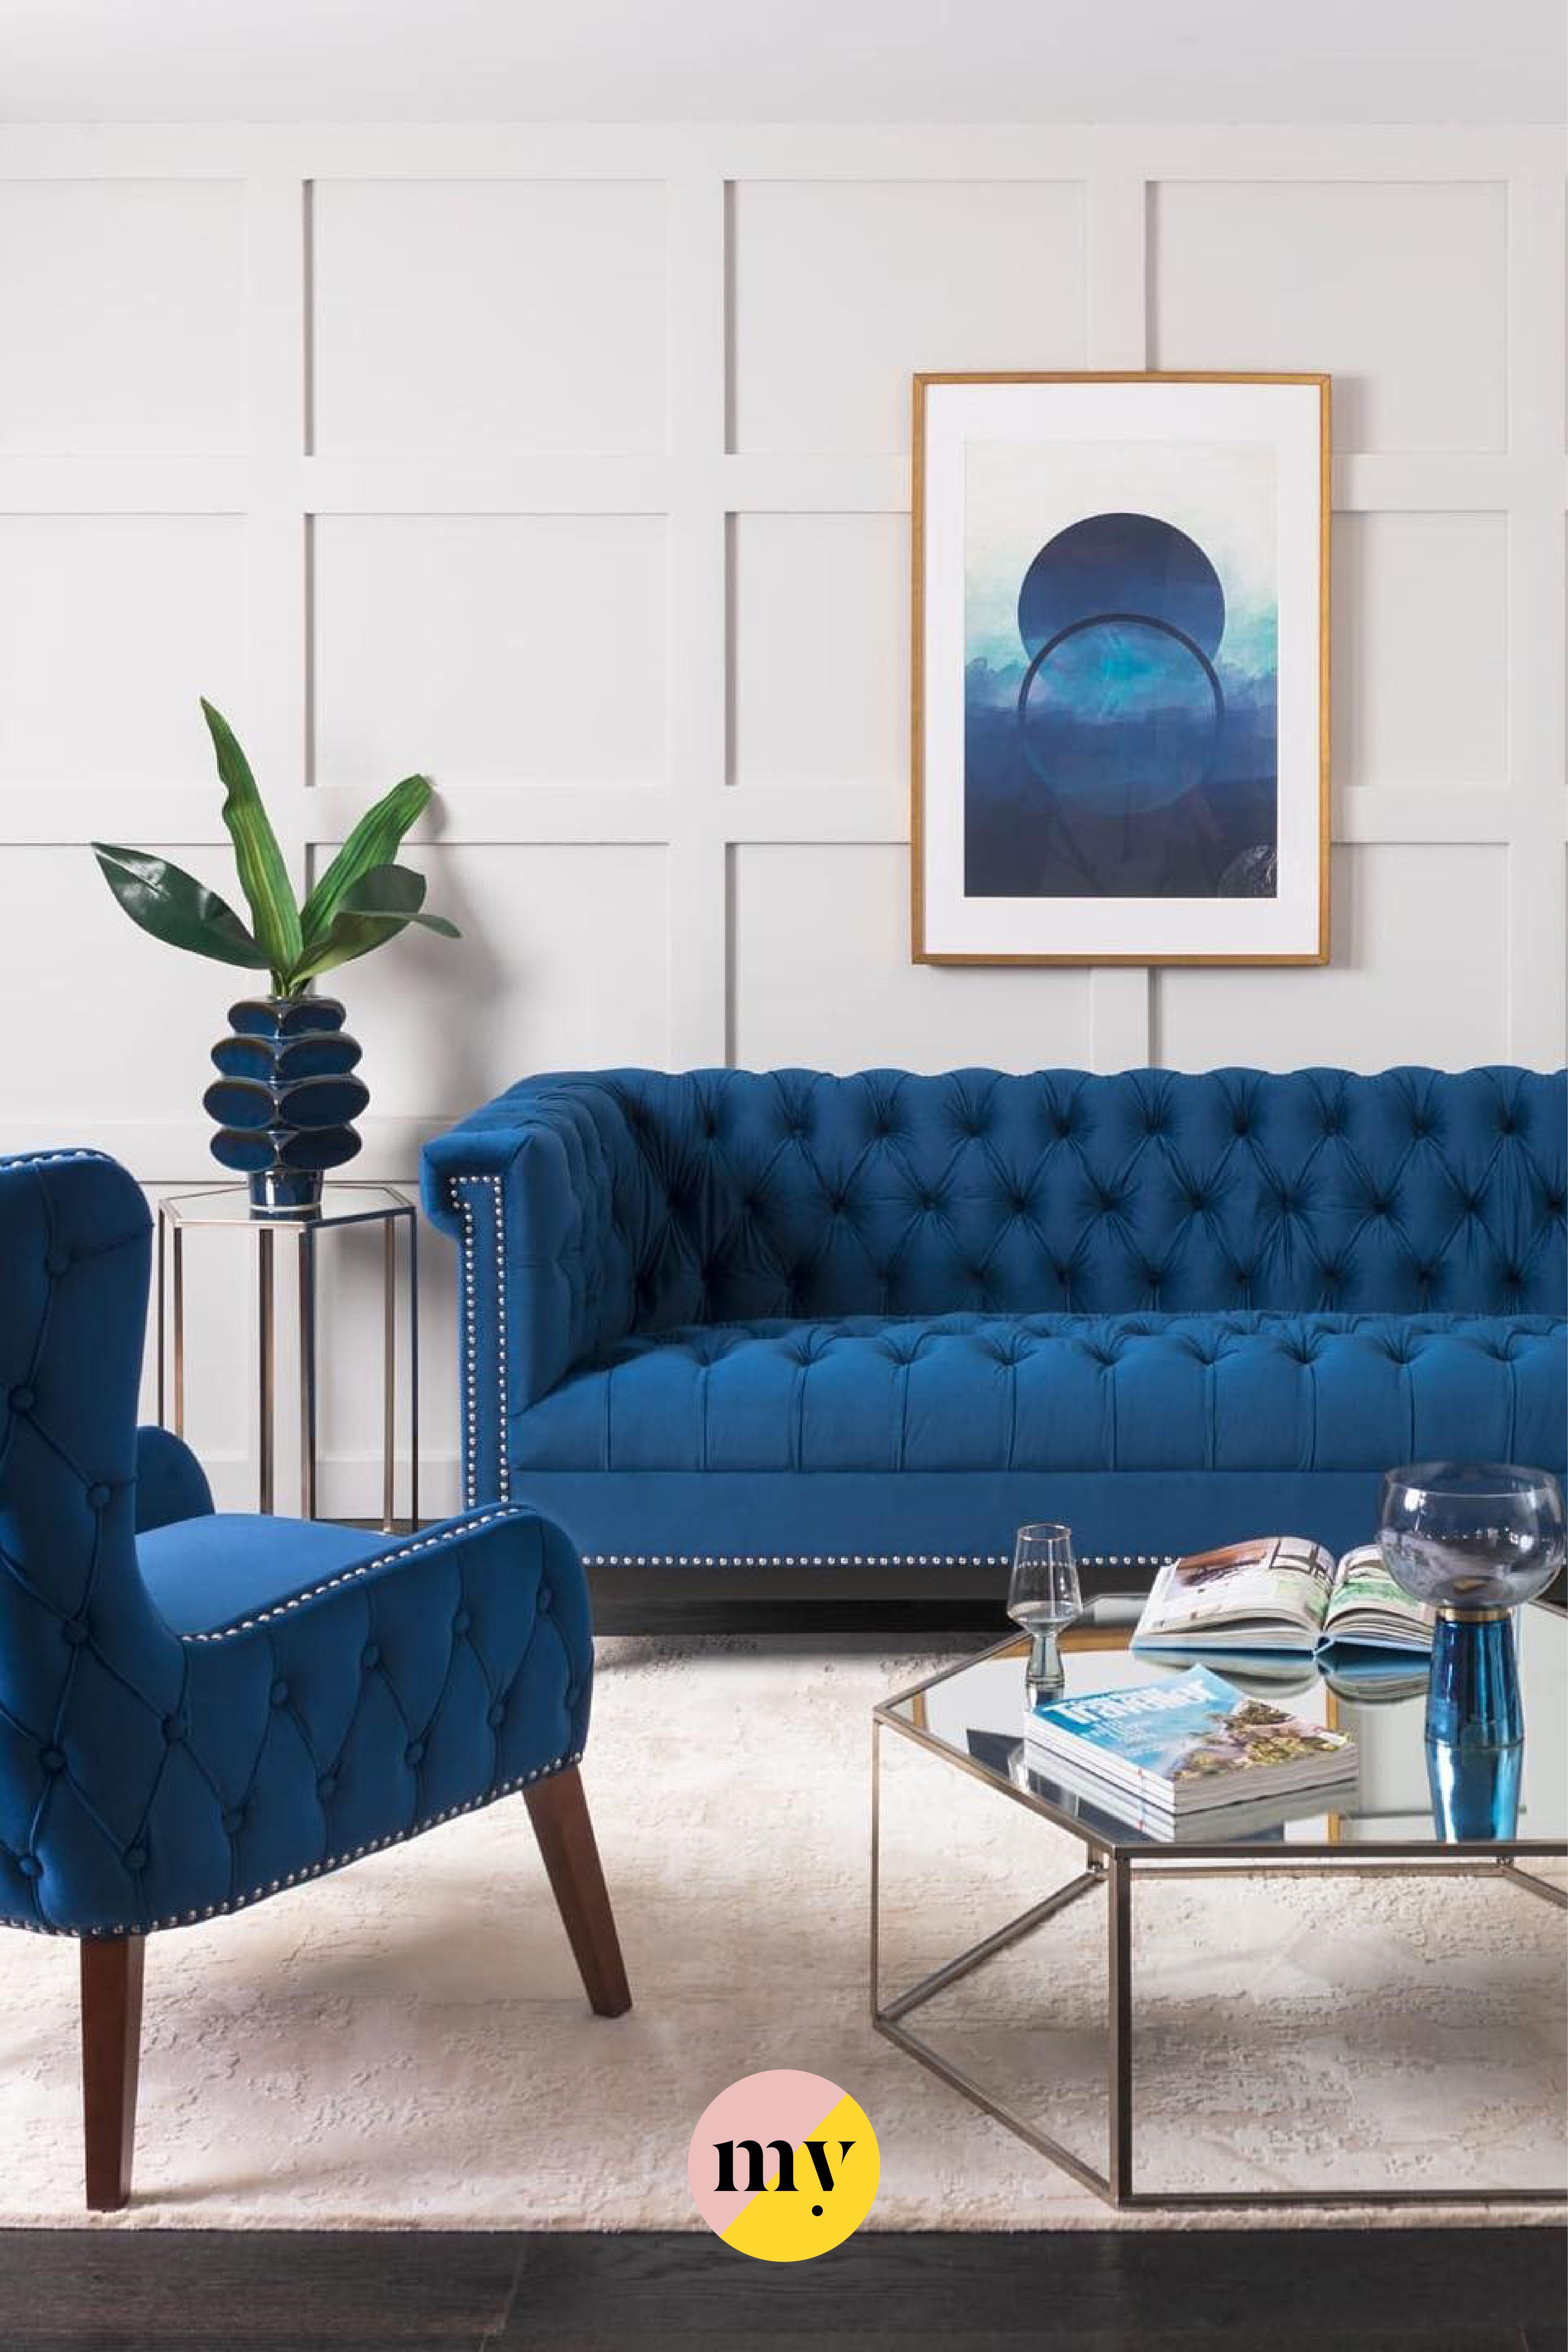 Bergmann Three Seat Sofa Navy Blue In 2020 Navy Blue Sofa Velvet Upholstery Fabric Sofa